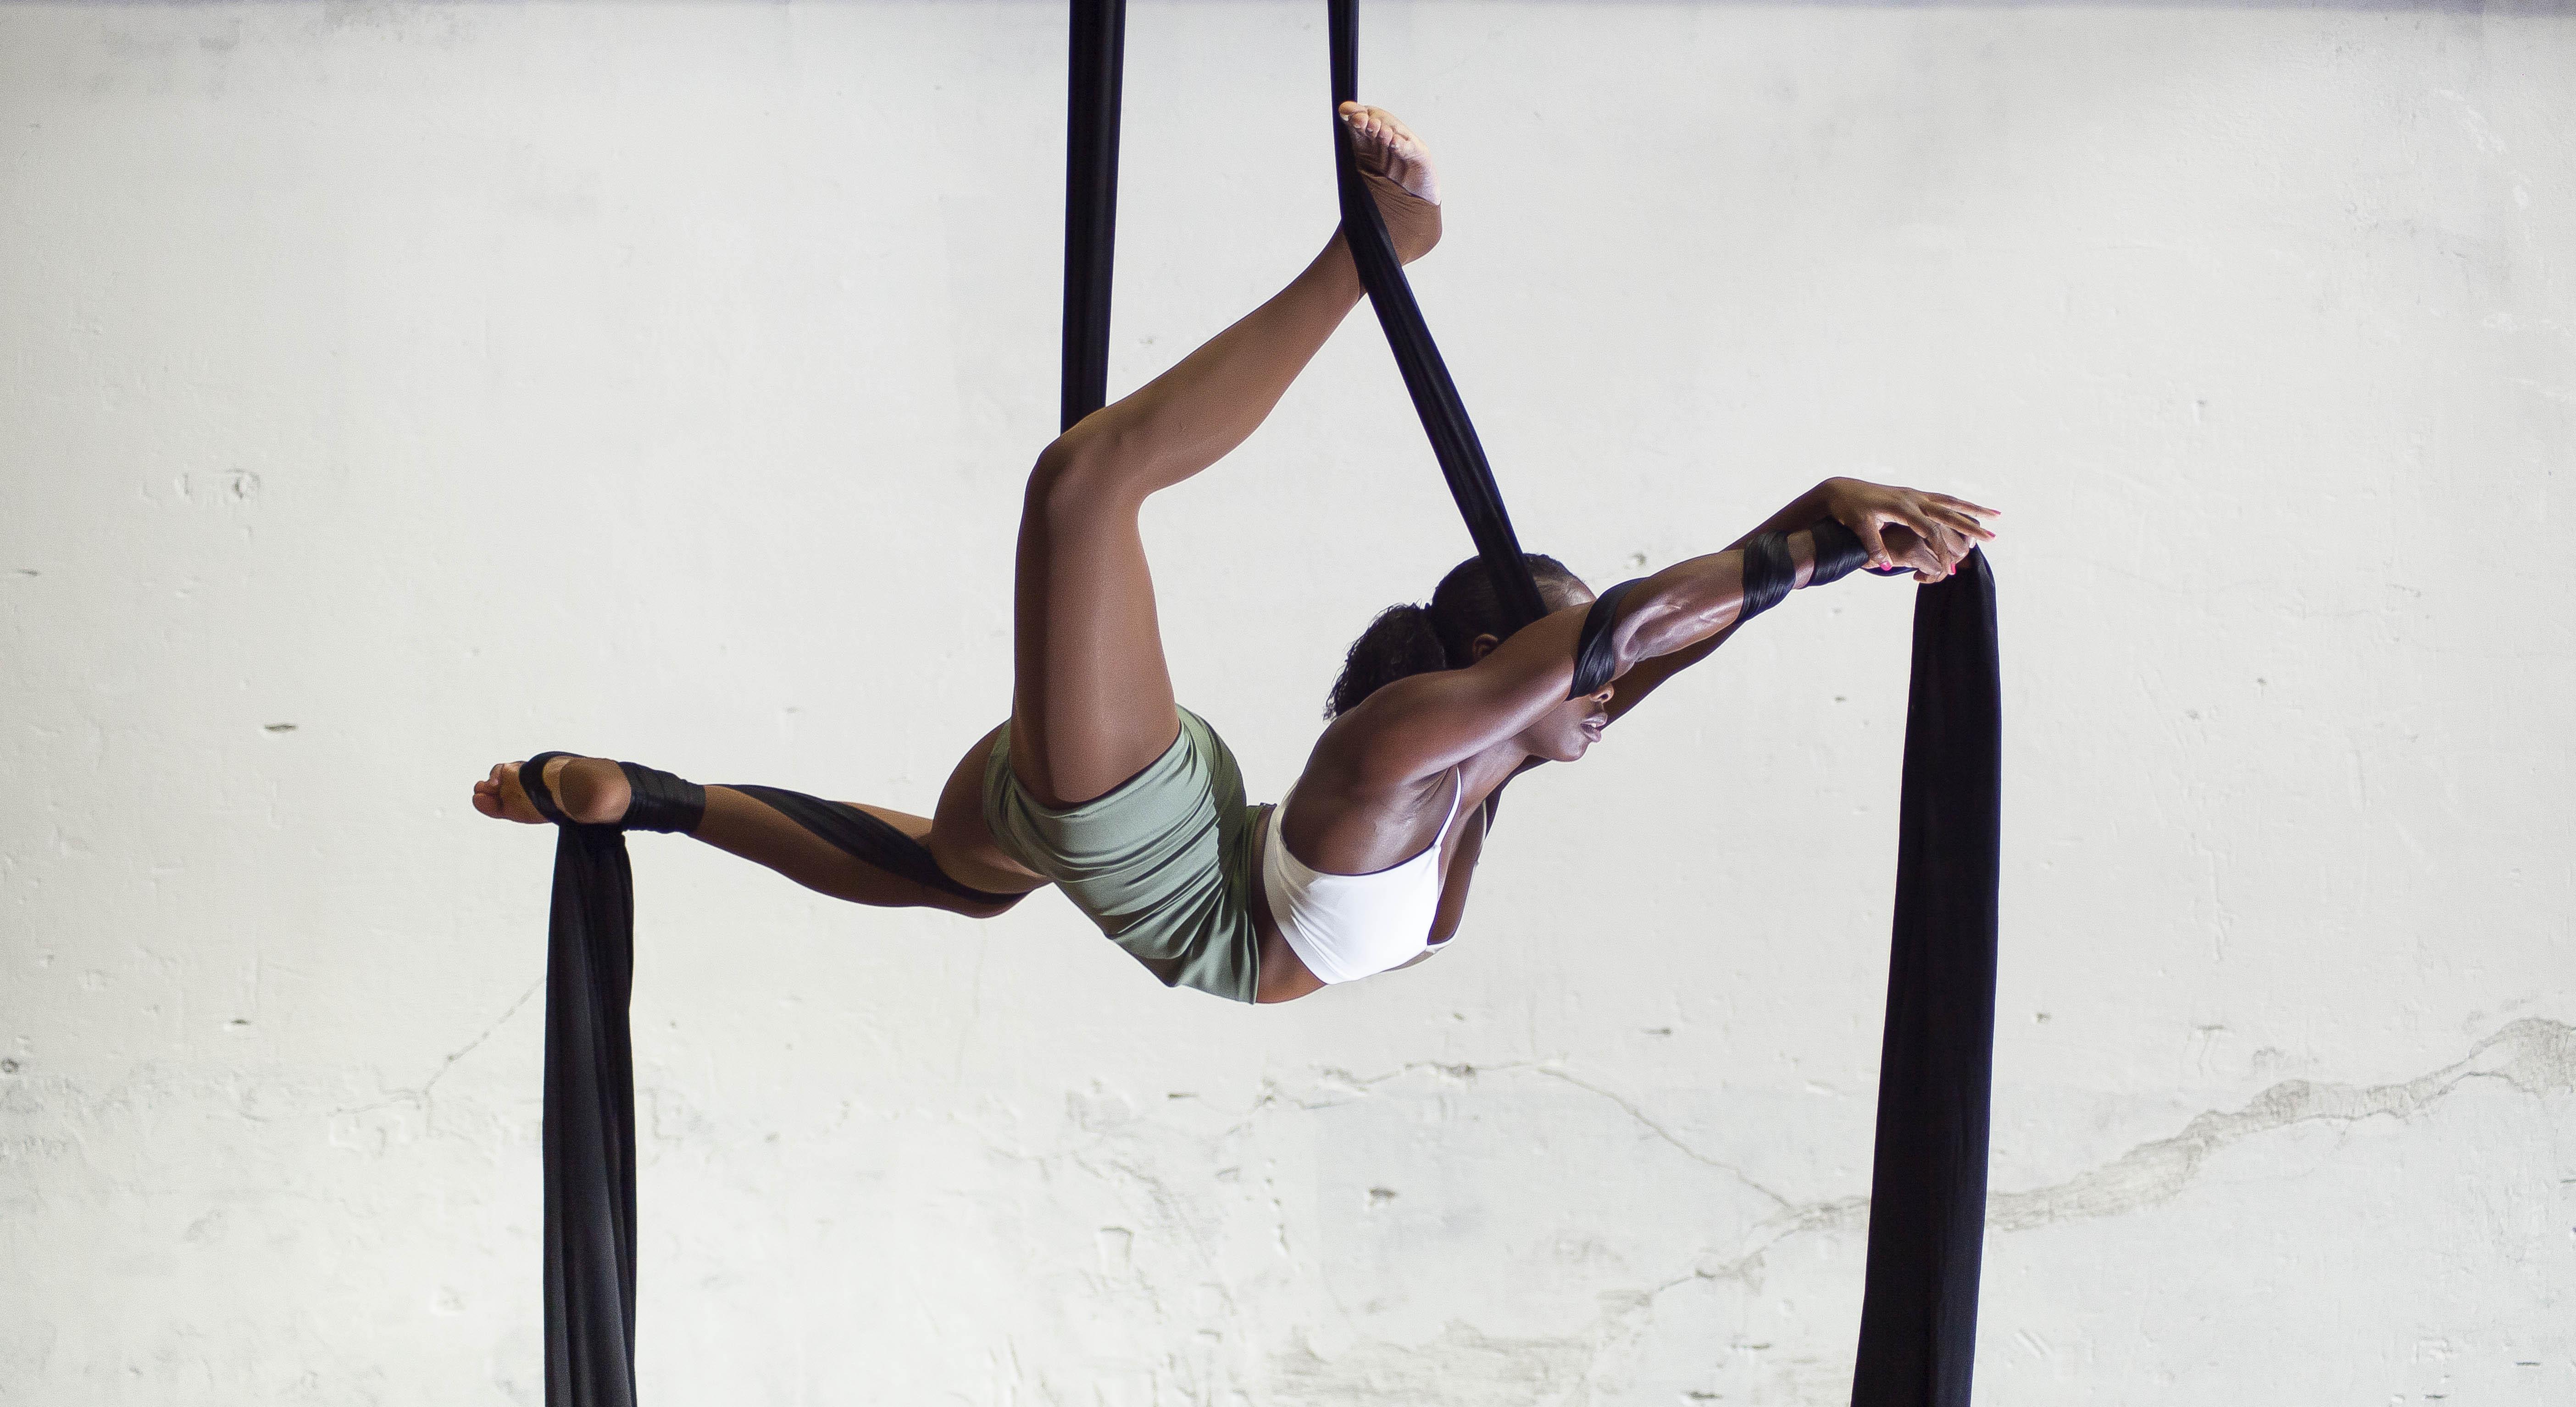 Aerial Silk Course